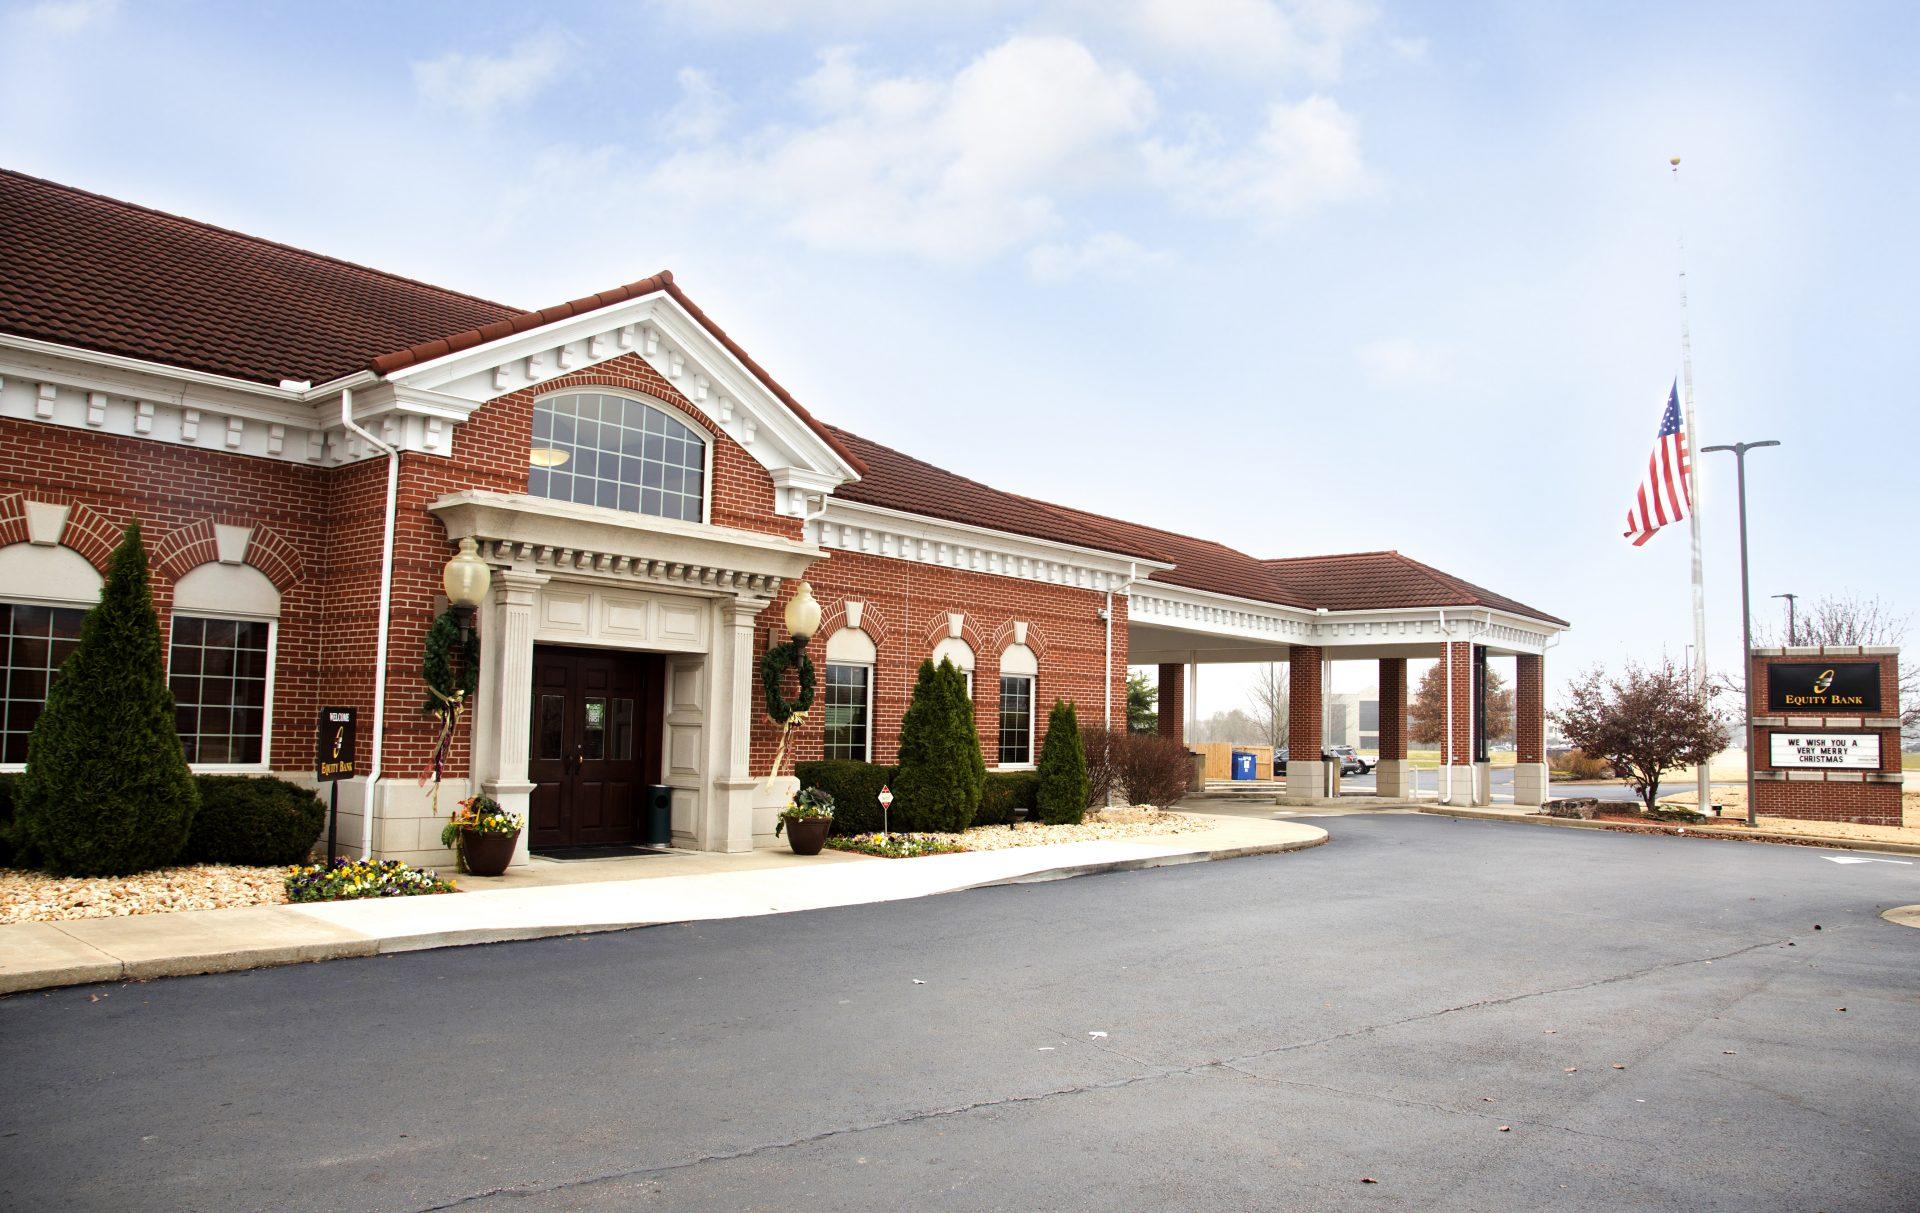 Equity Bank Eureka Springs branch exterior.